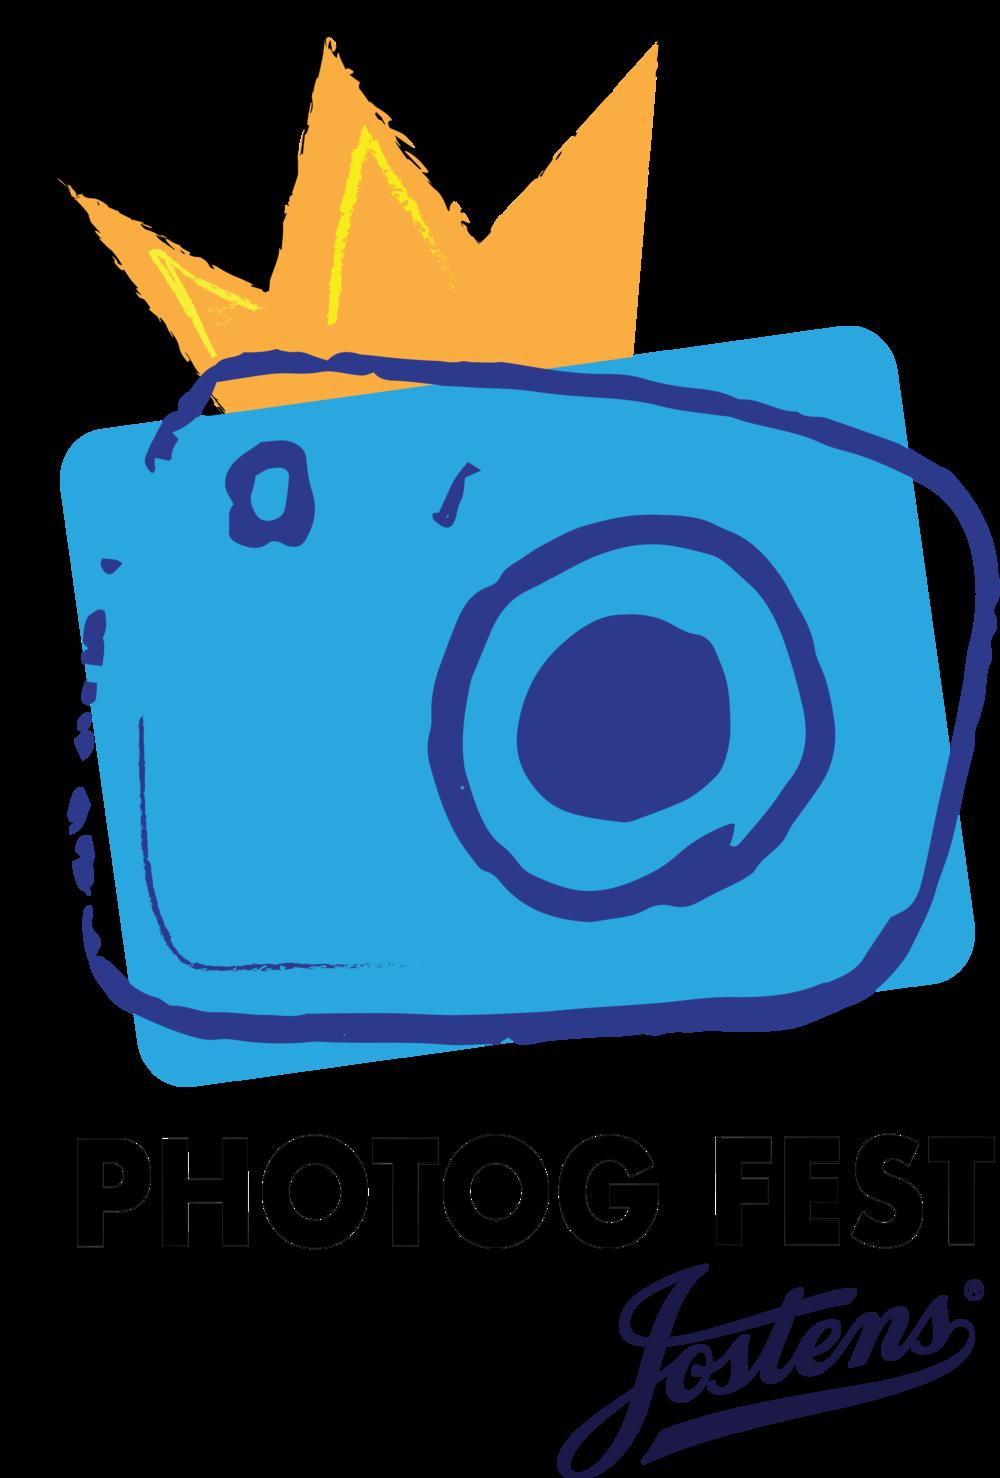 Photog Fest X Jostens.png